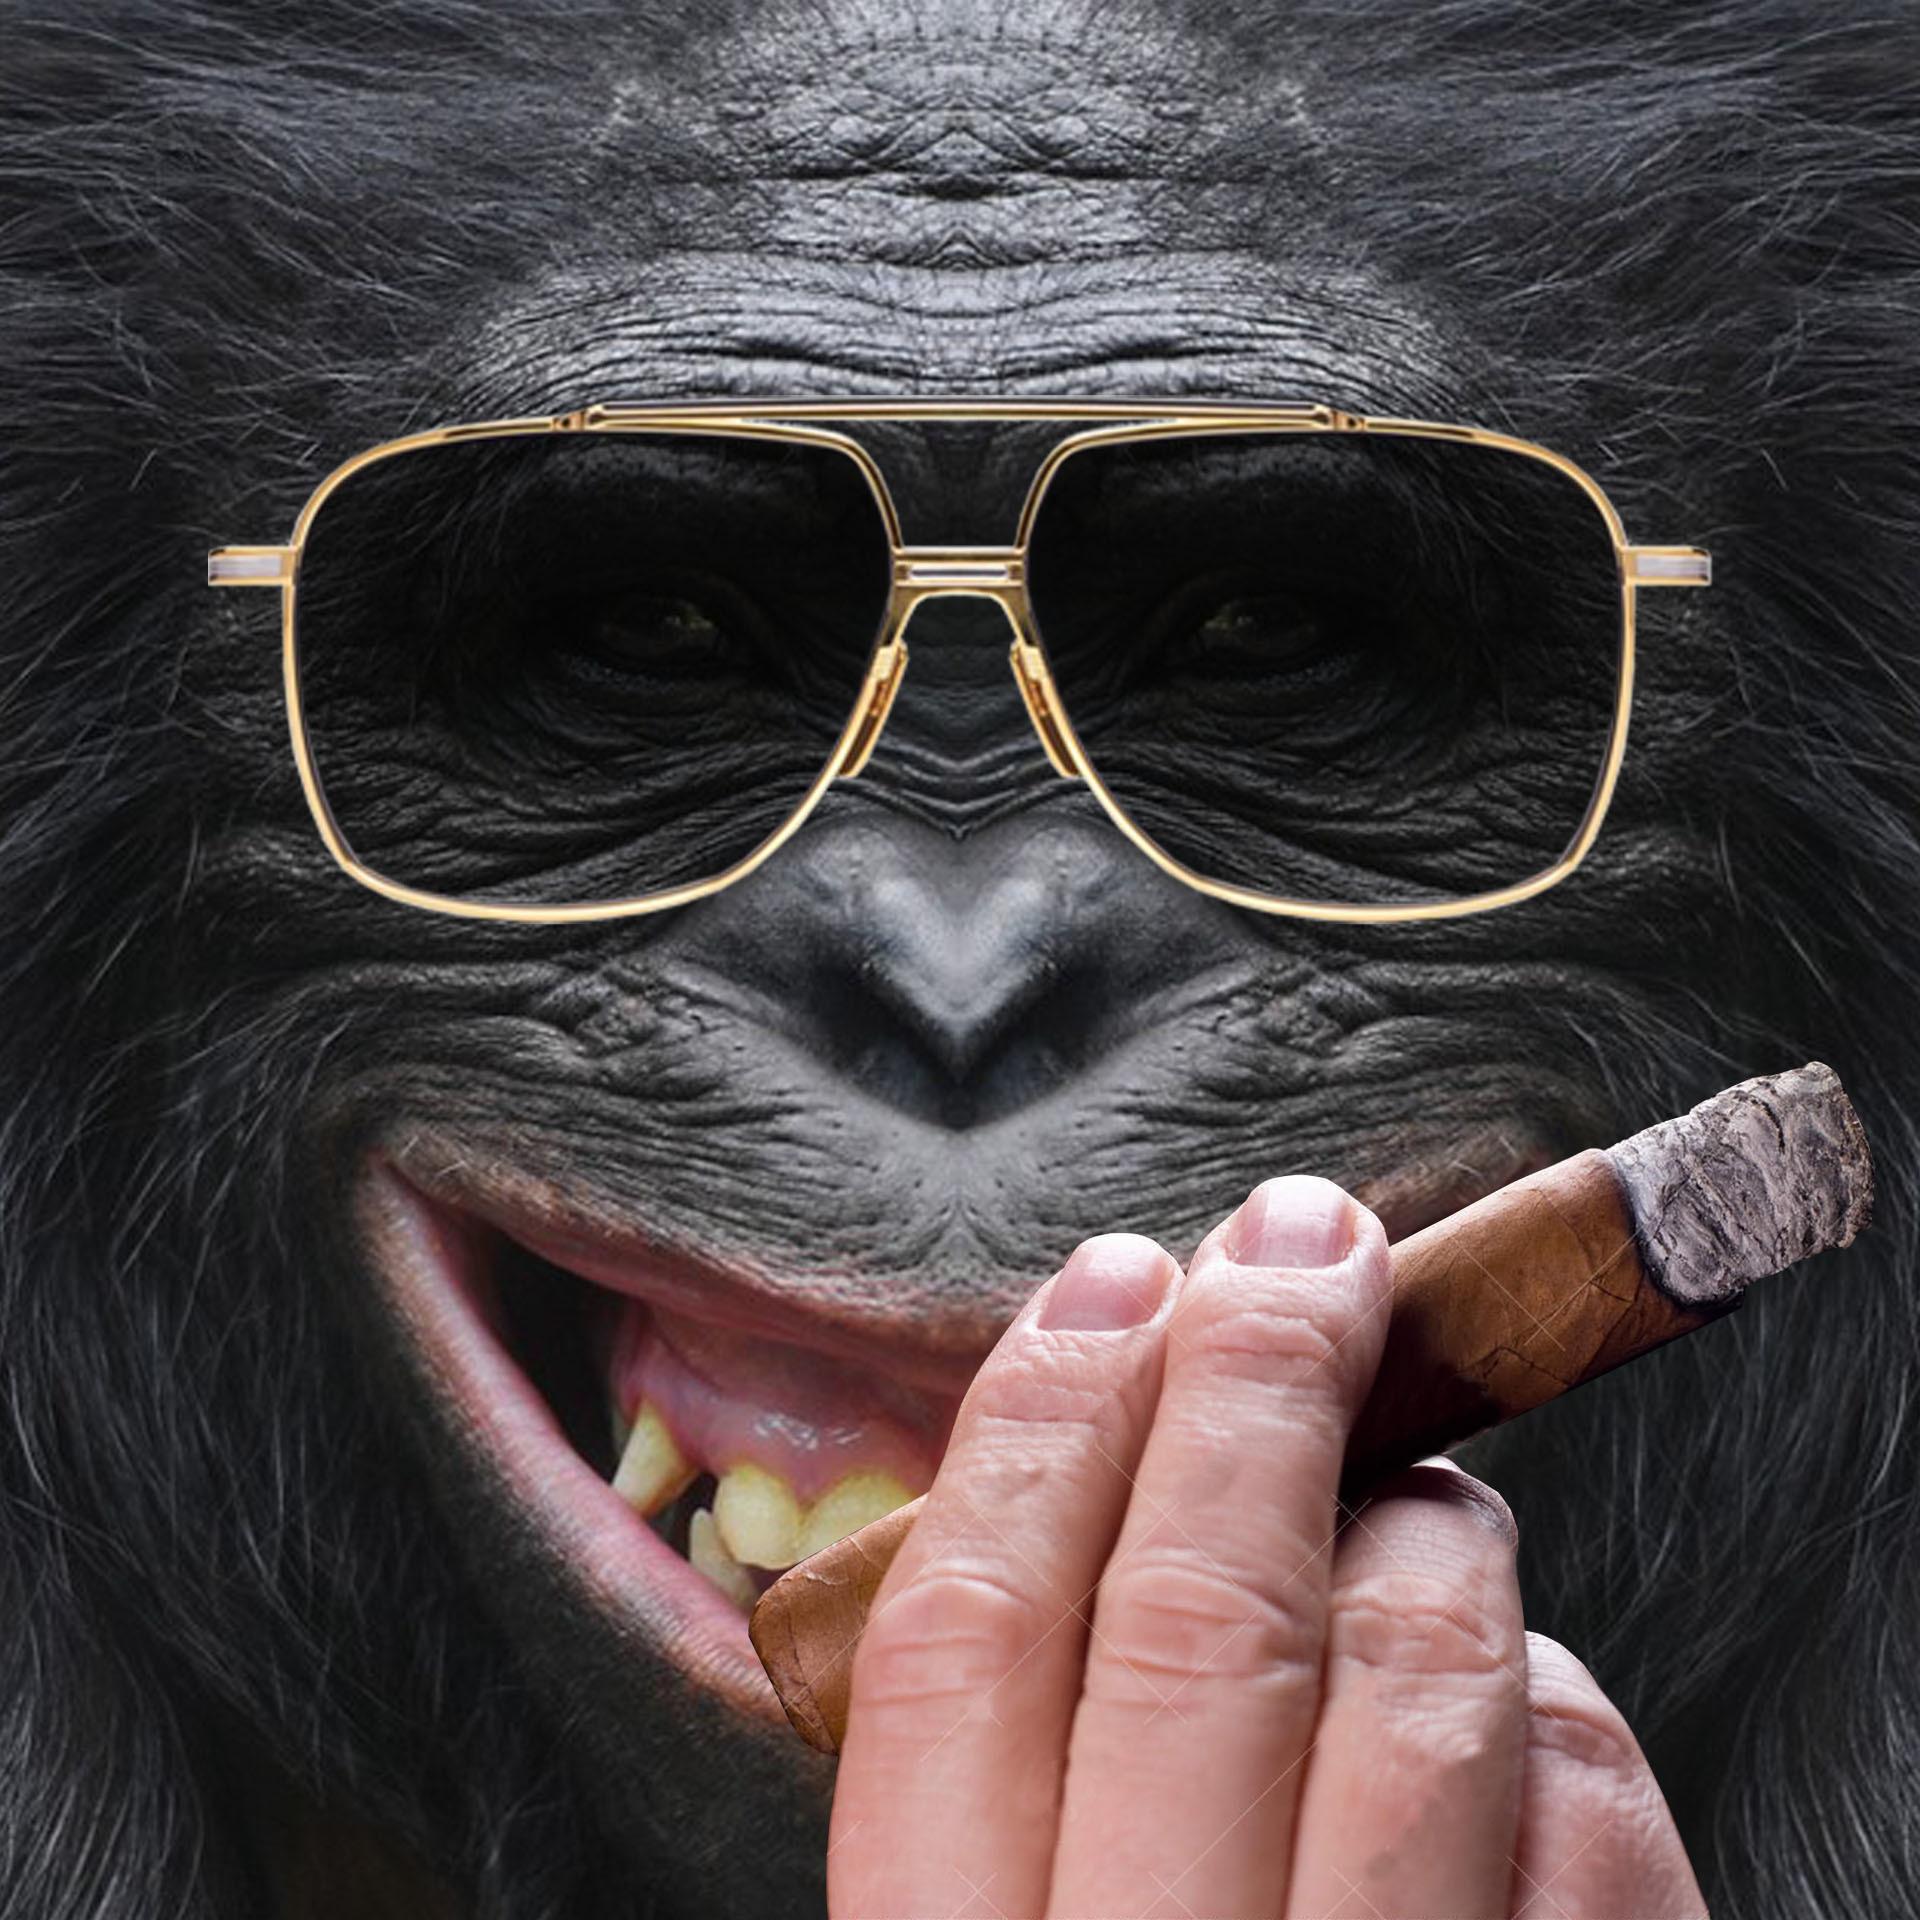 1617156743-monkey-rich-cigare.jpg